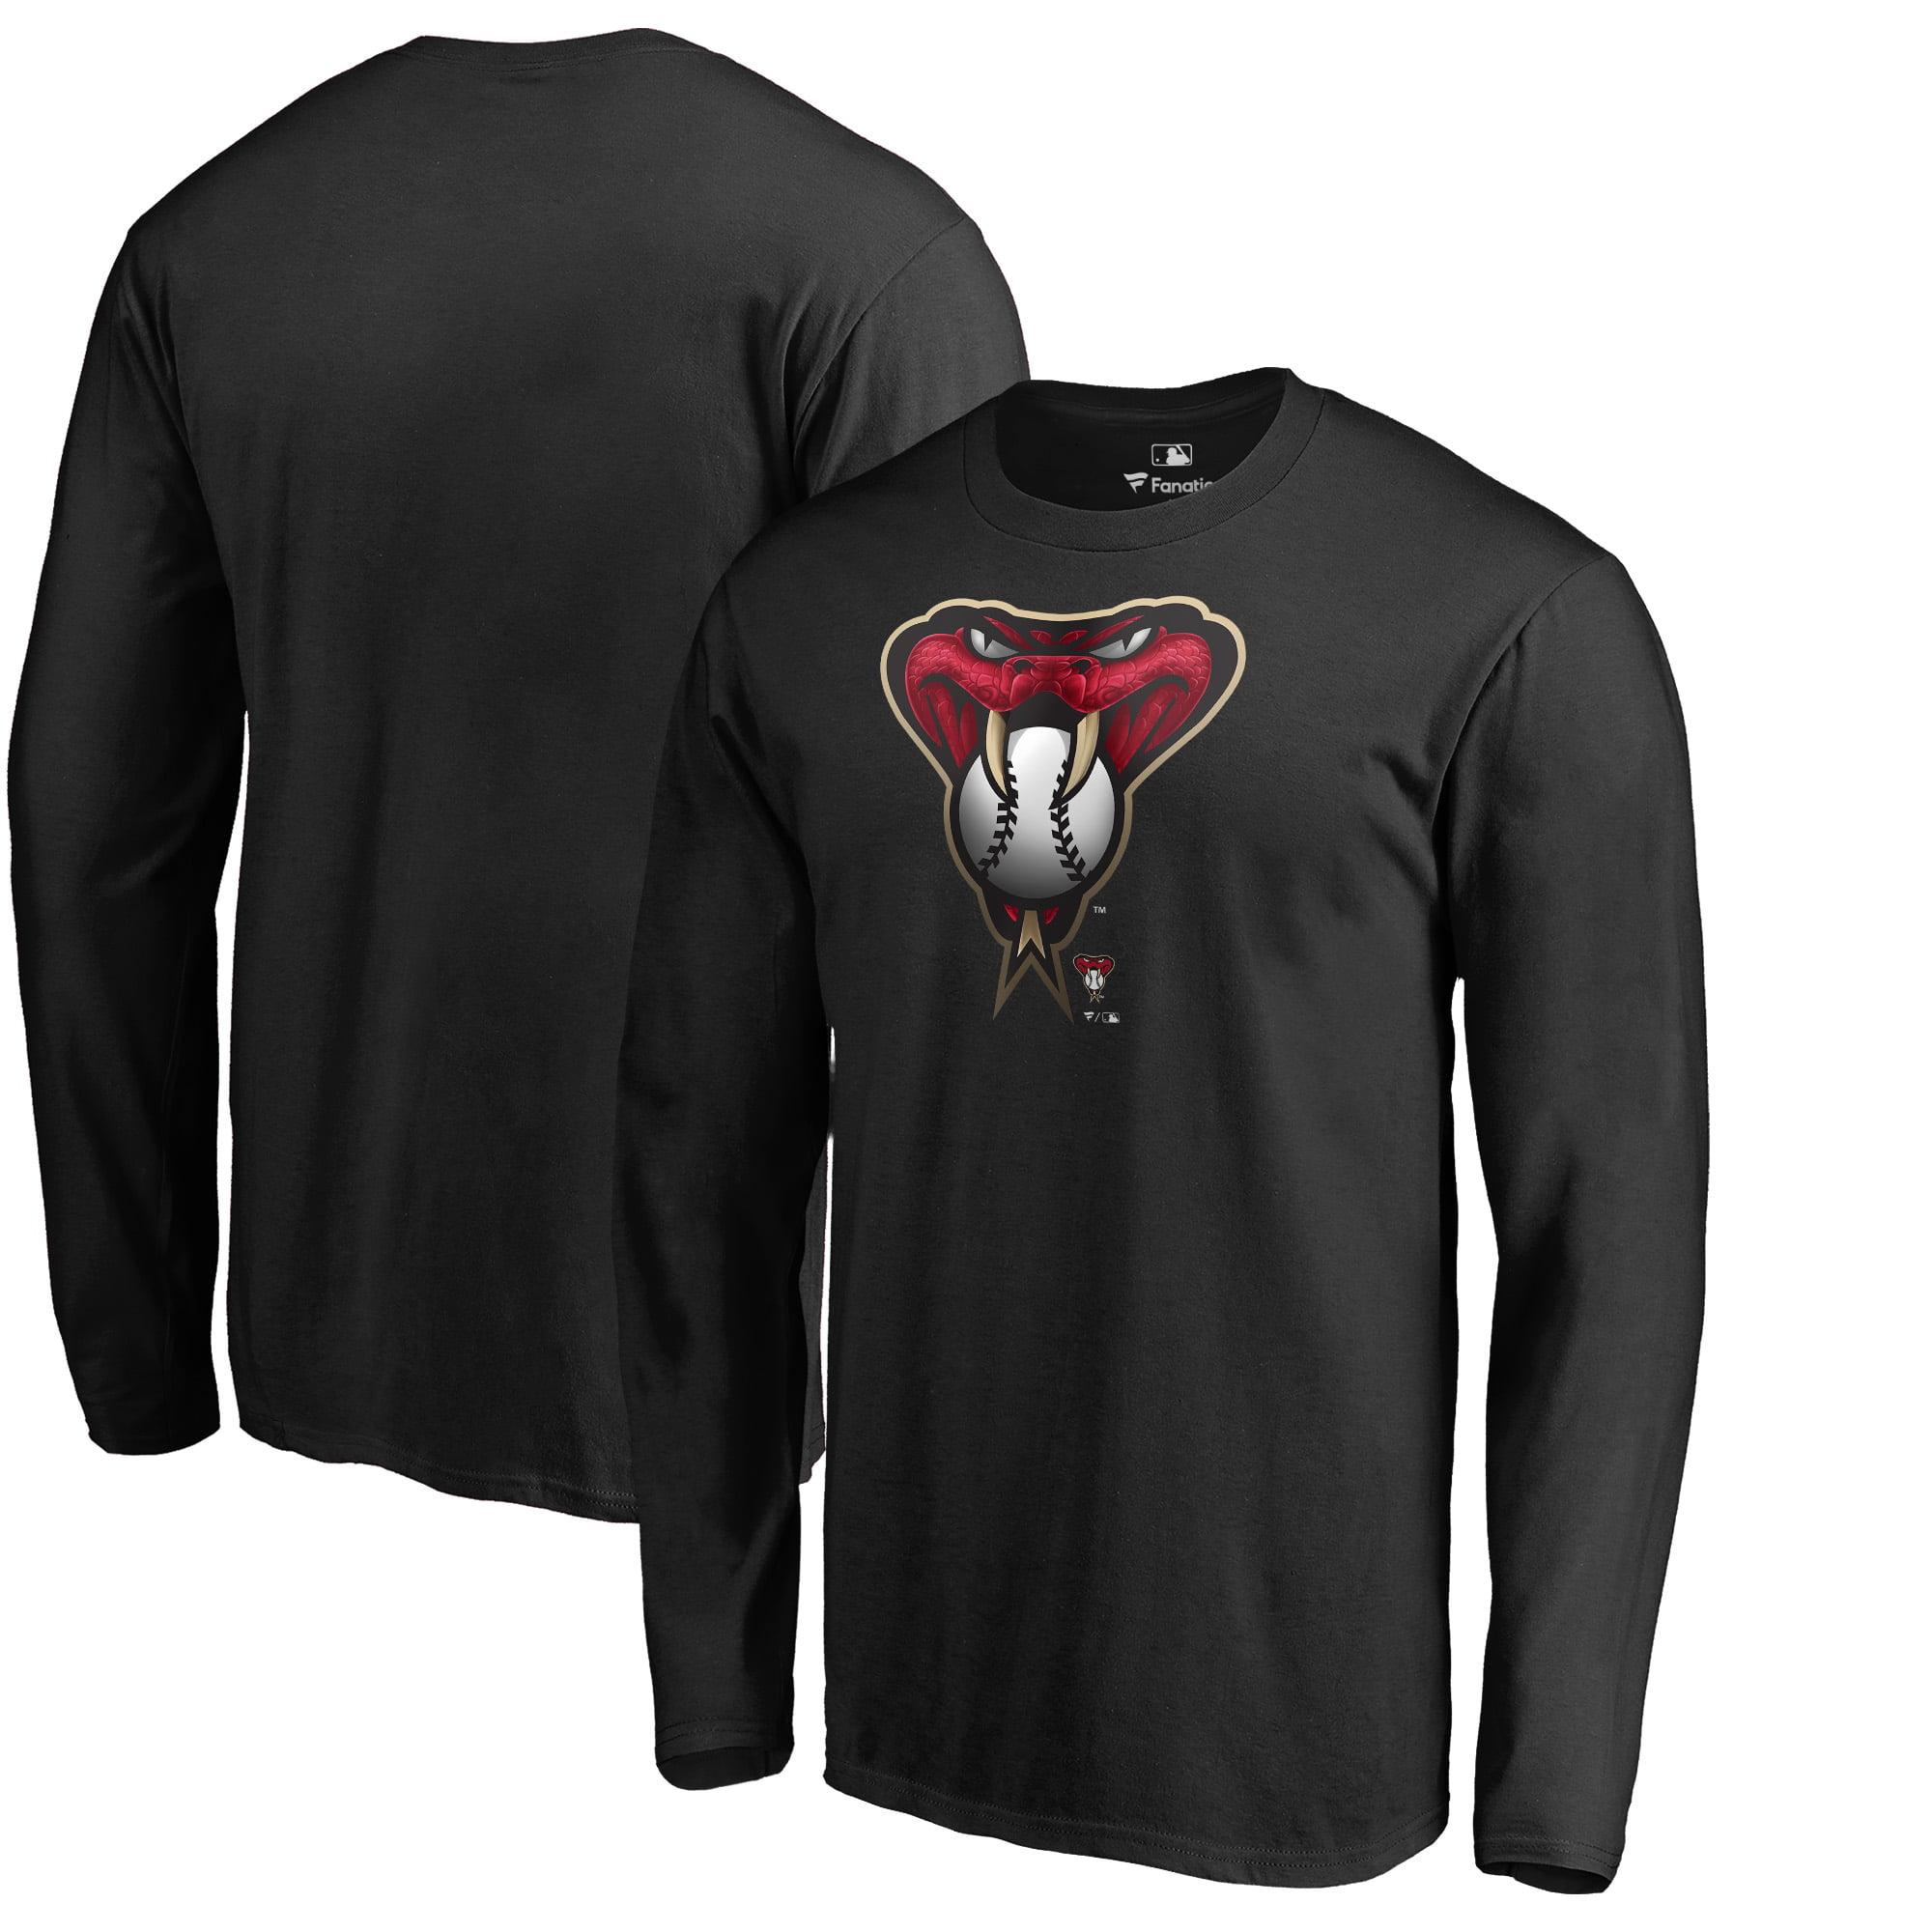 Arizona Diamondbacks Fanatics Branded Midnight Mascot Long Sleeve T-Shirt - Black